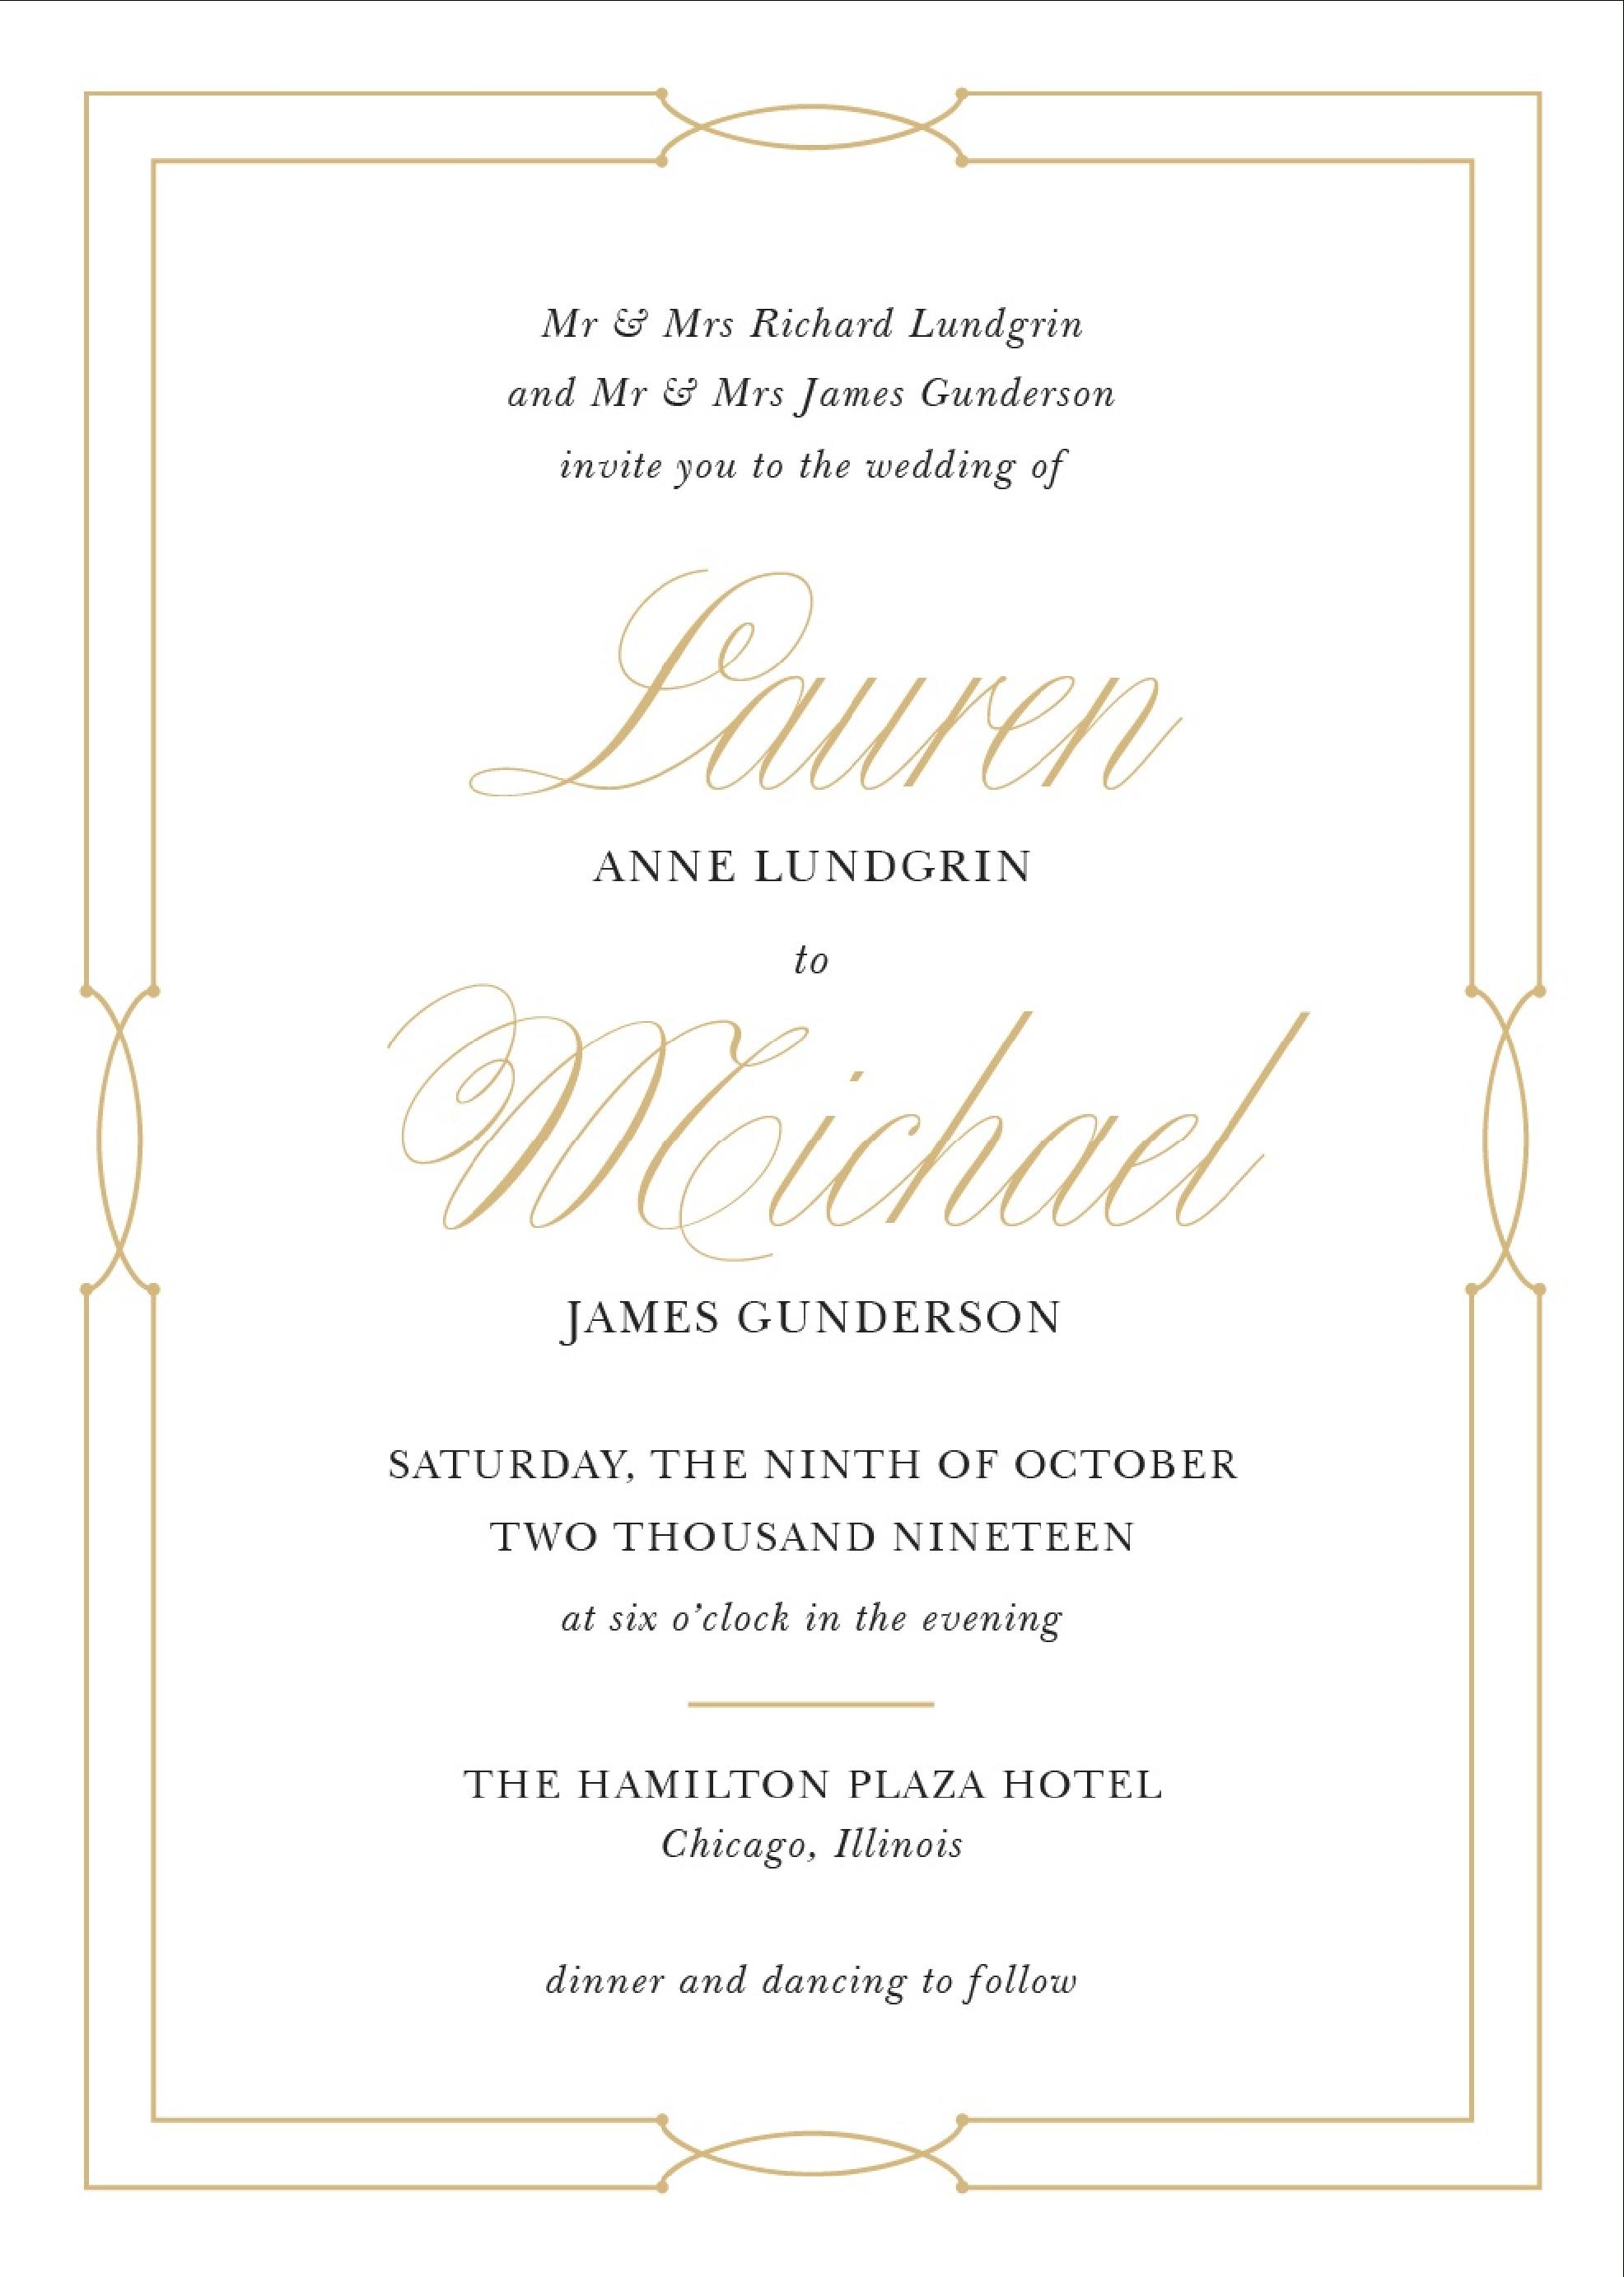 Wedding Invitation Wording Samples - Free Printable Registry Cards